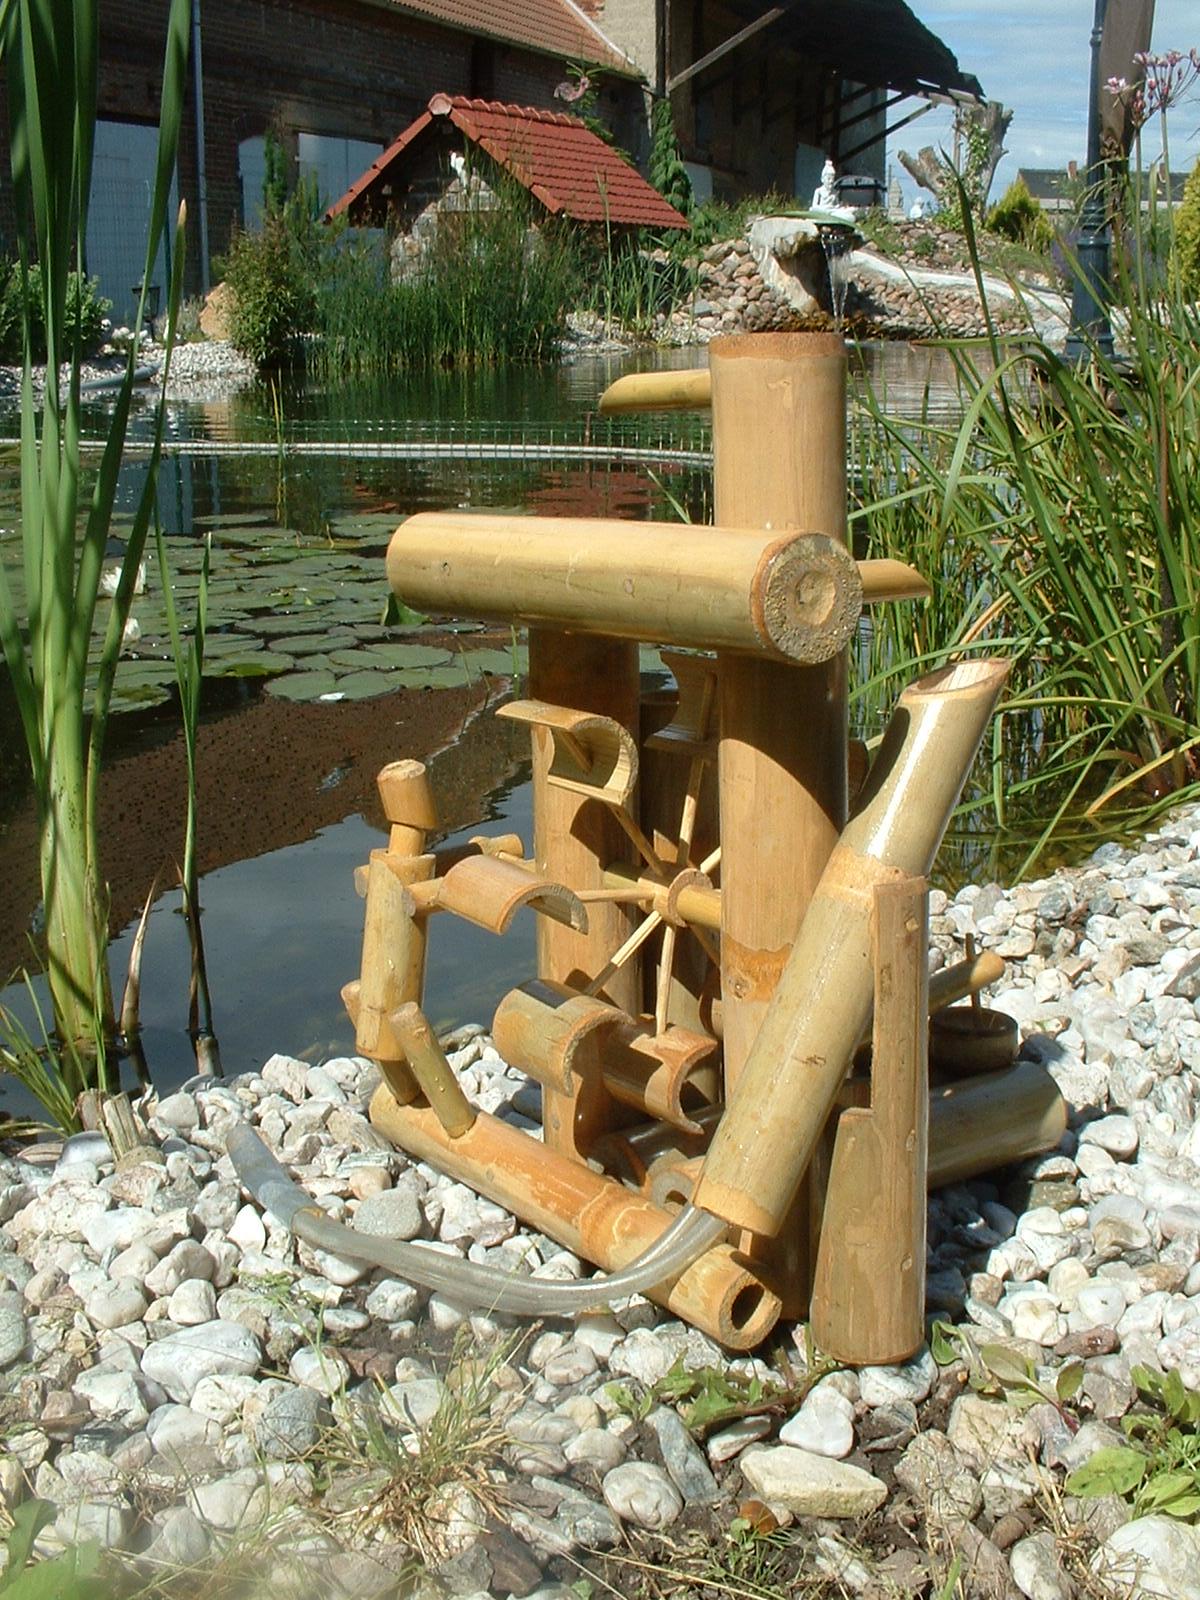 fontaine bambou cascade jeu d 39 eau d coration jardin patio. Black Bedroom Furniture Sets. Home Design Ideas